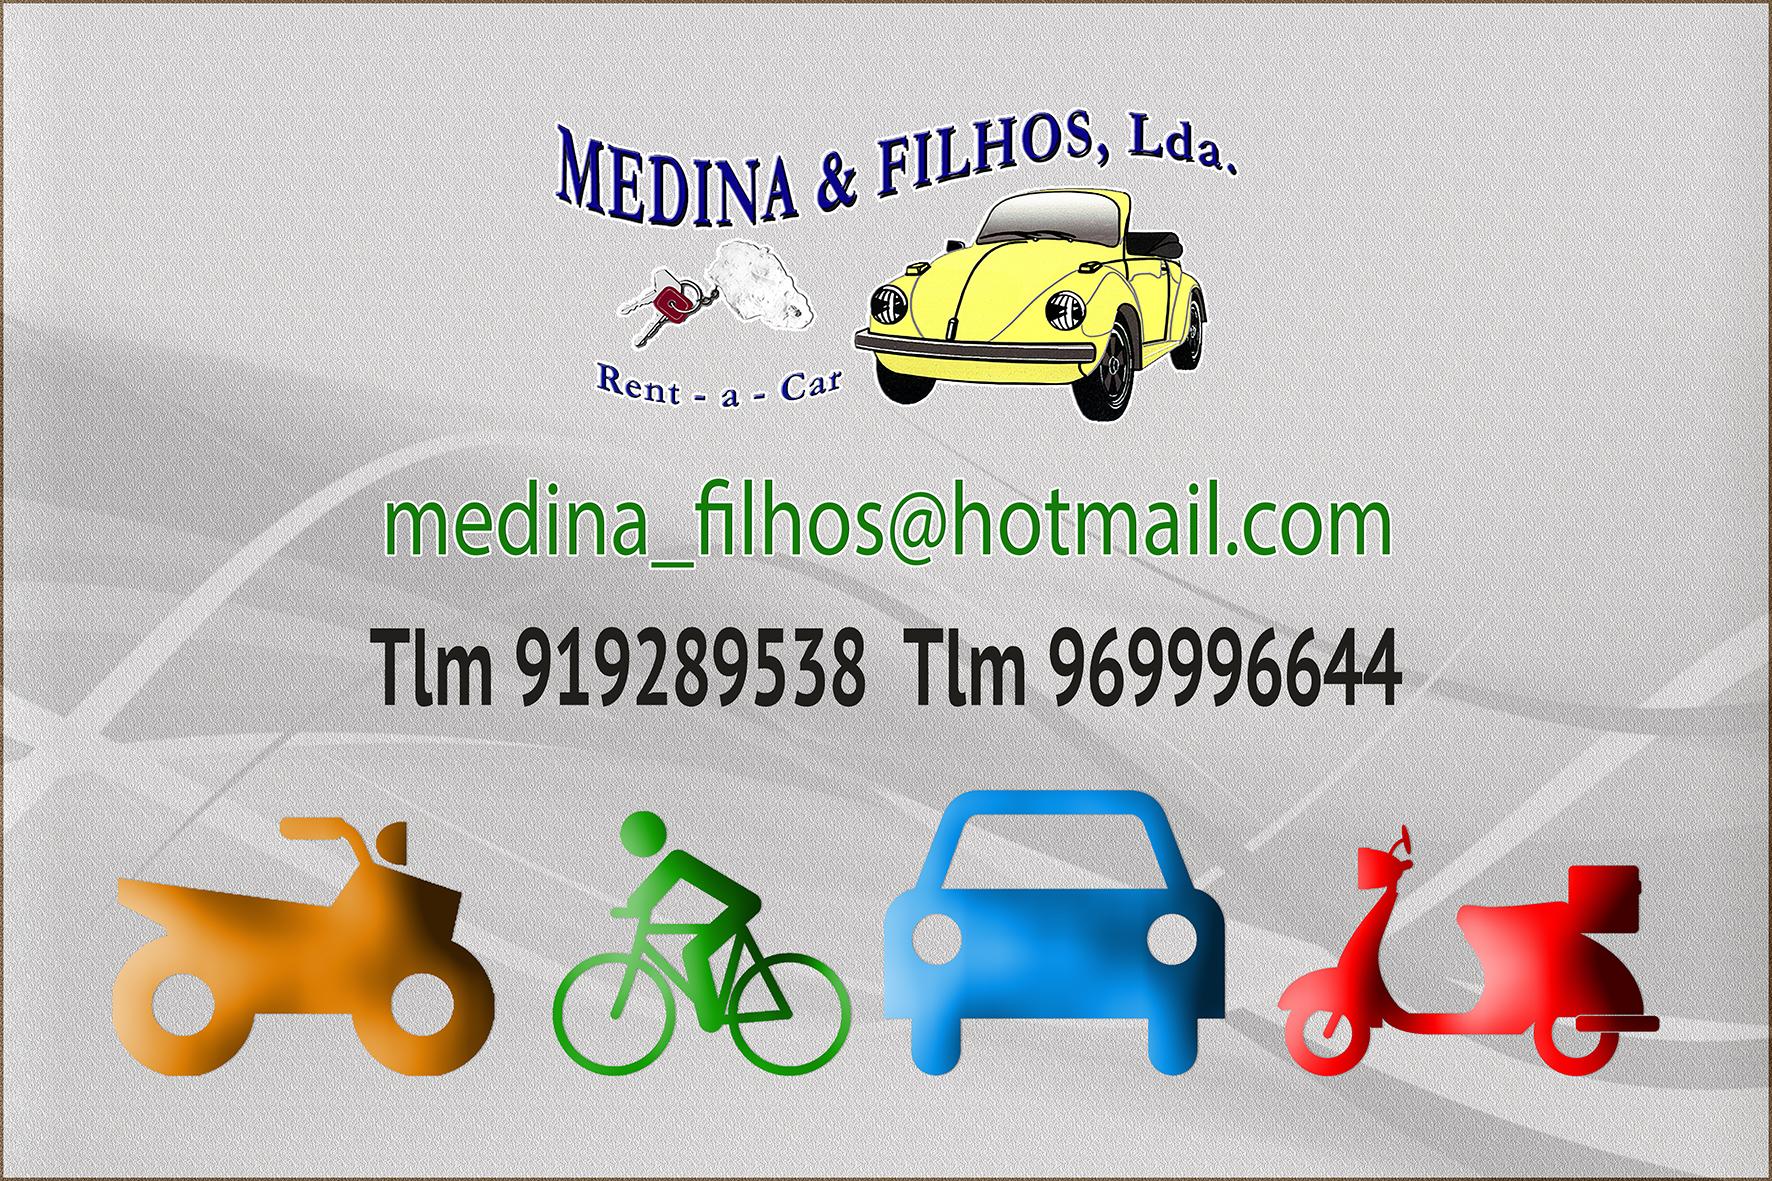 Rent-A-Car Medina & Filhos, Lda.